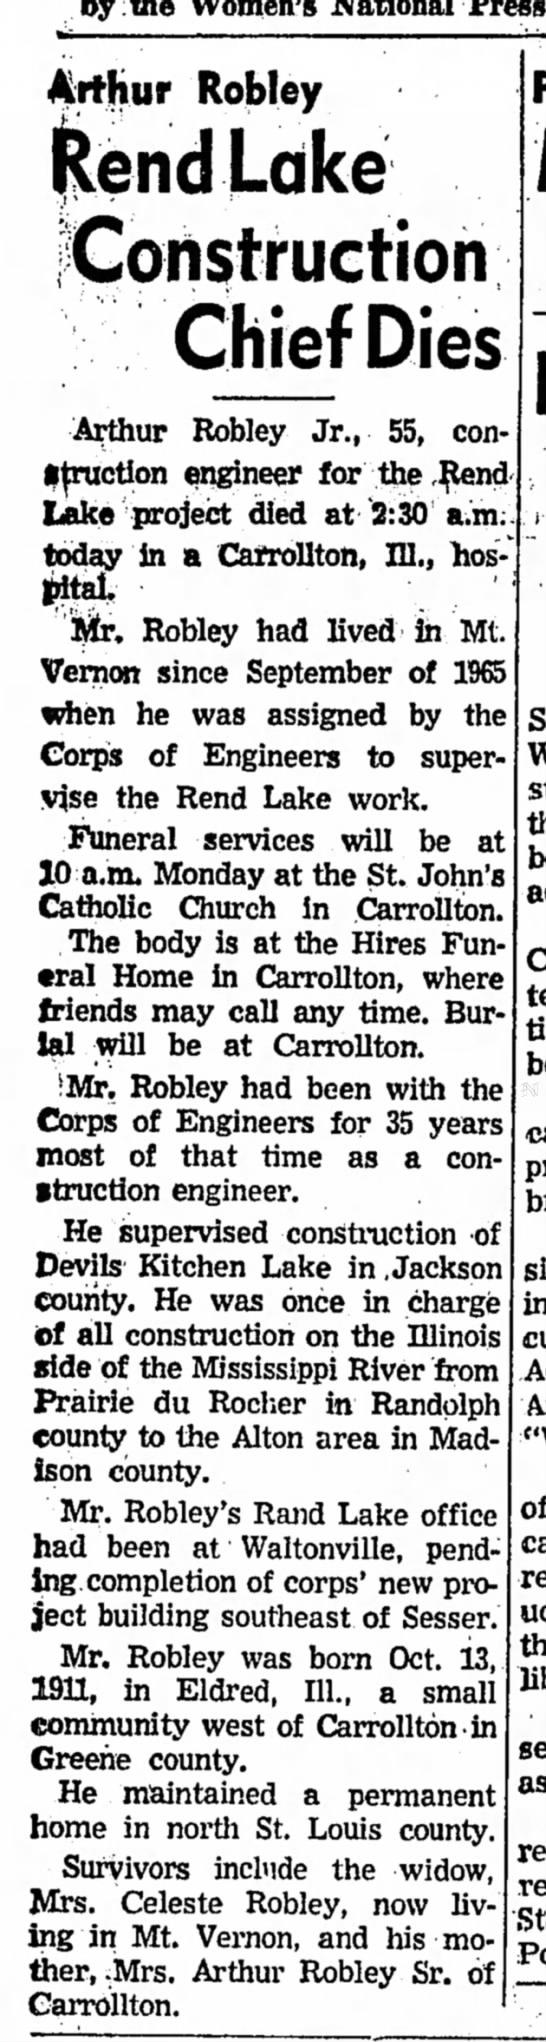 Arthur Robley, Jr. - Obit. Mt. Vernon Register-News, Illinois-4 May 1967, page 1 -